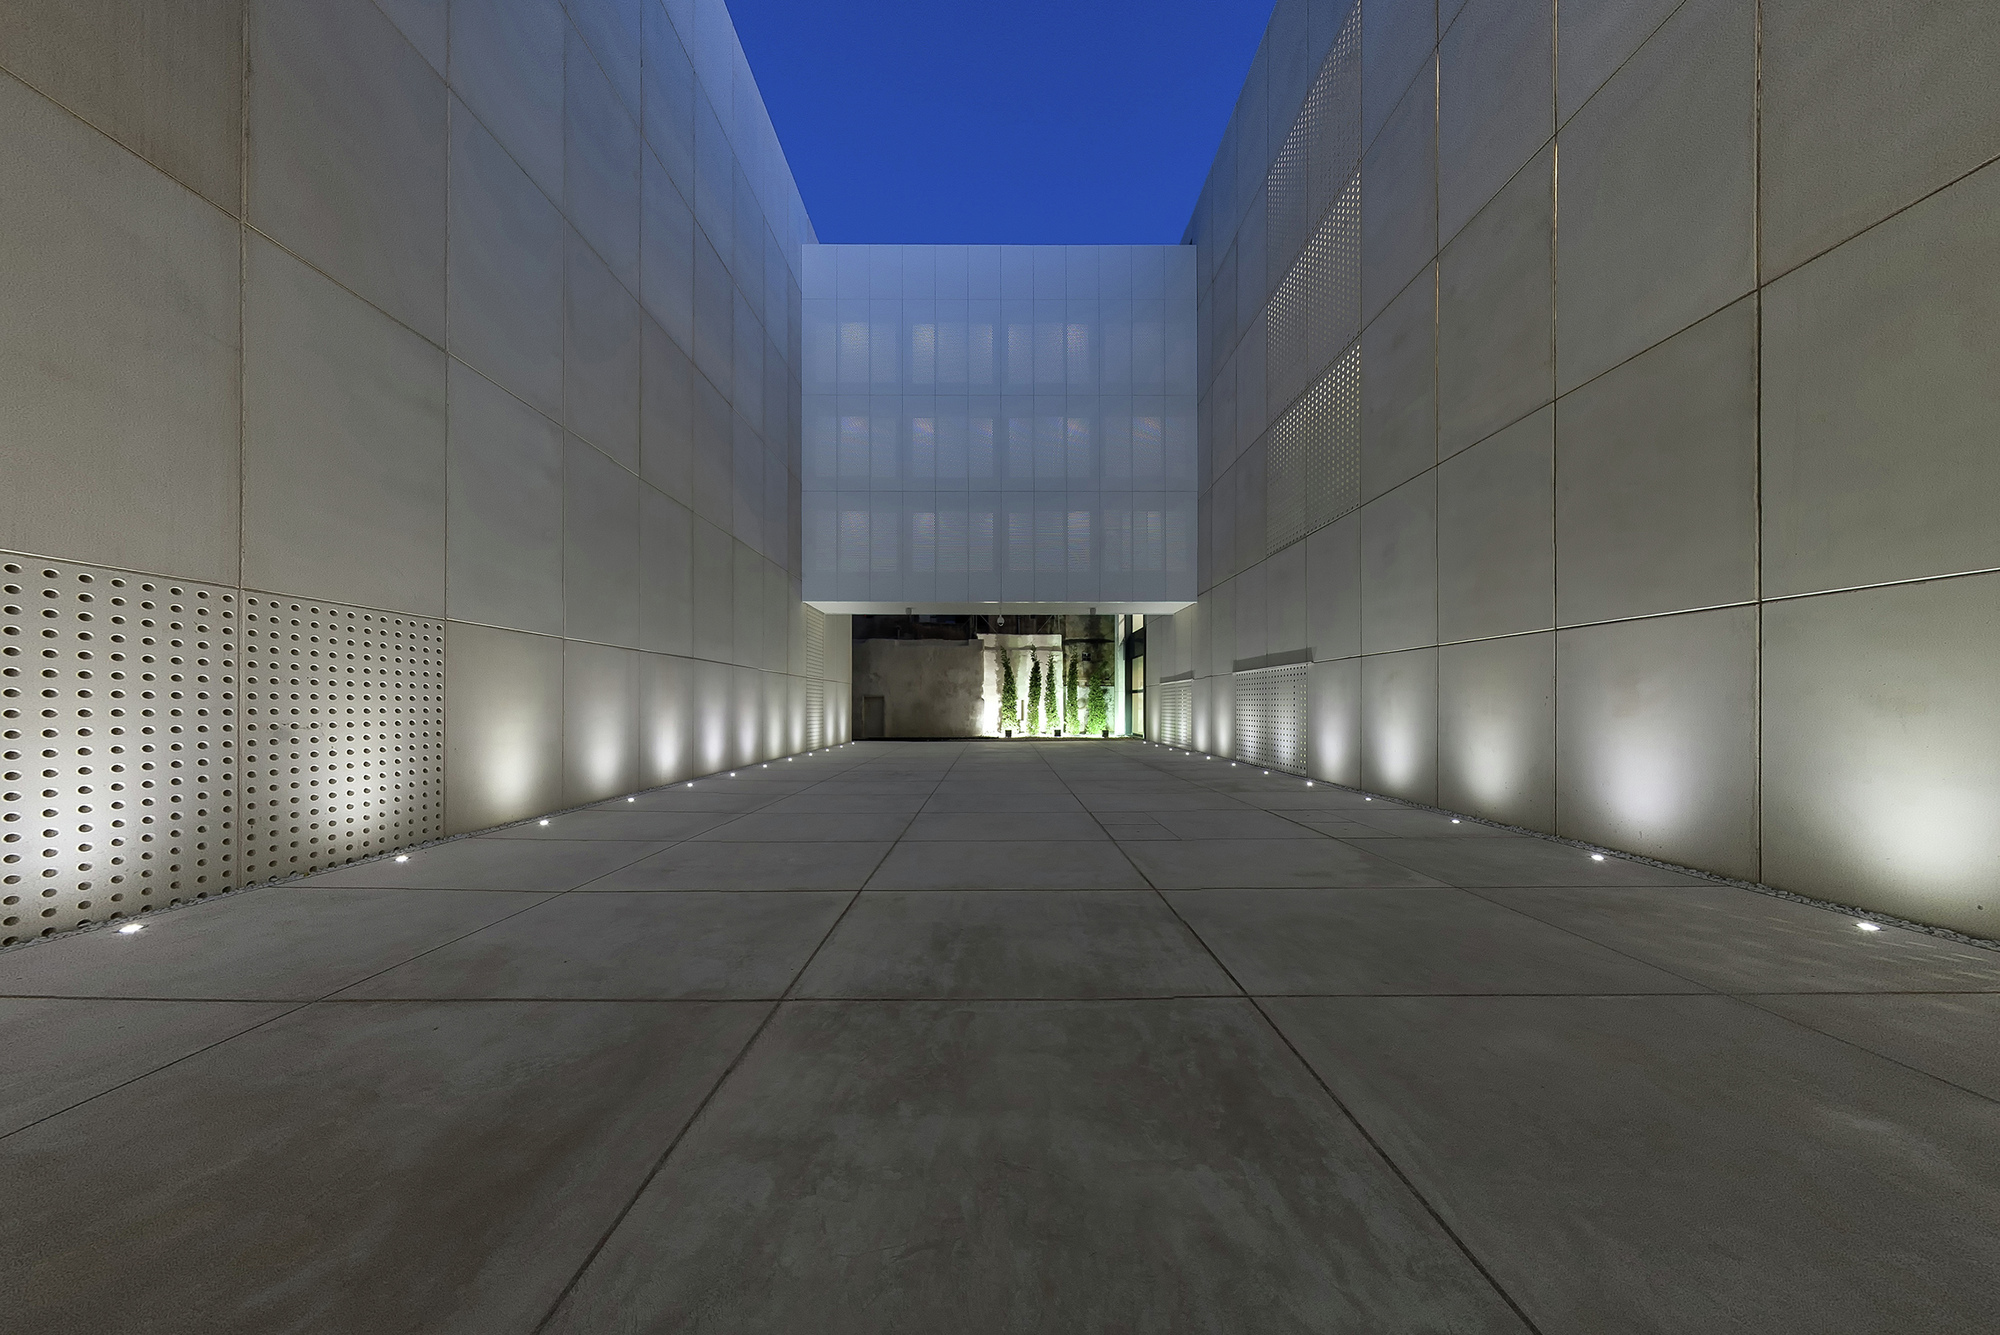 Galeria de os arquivos do reino de mallorca estudio de for Estudios de arquitectura famosos